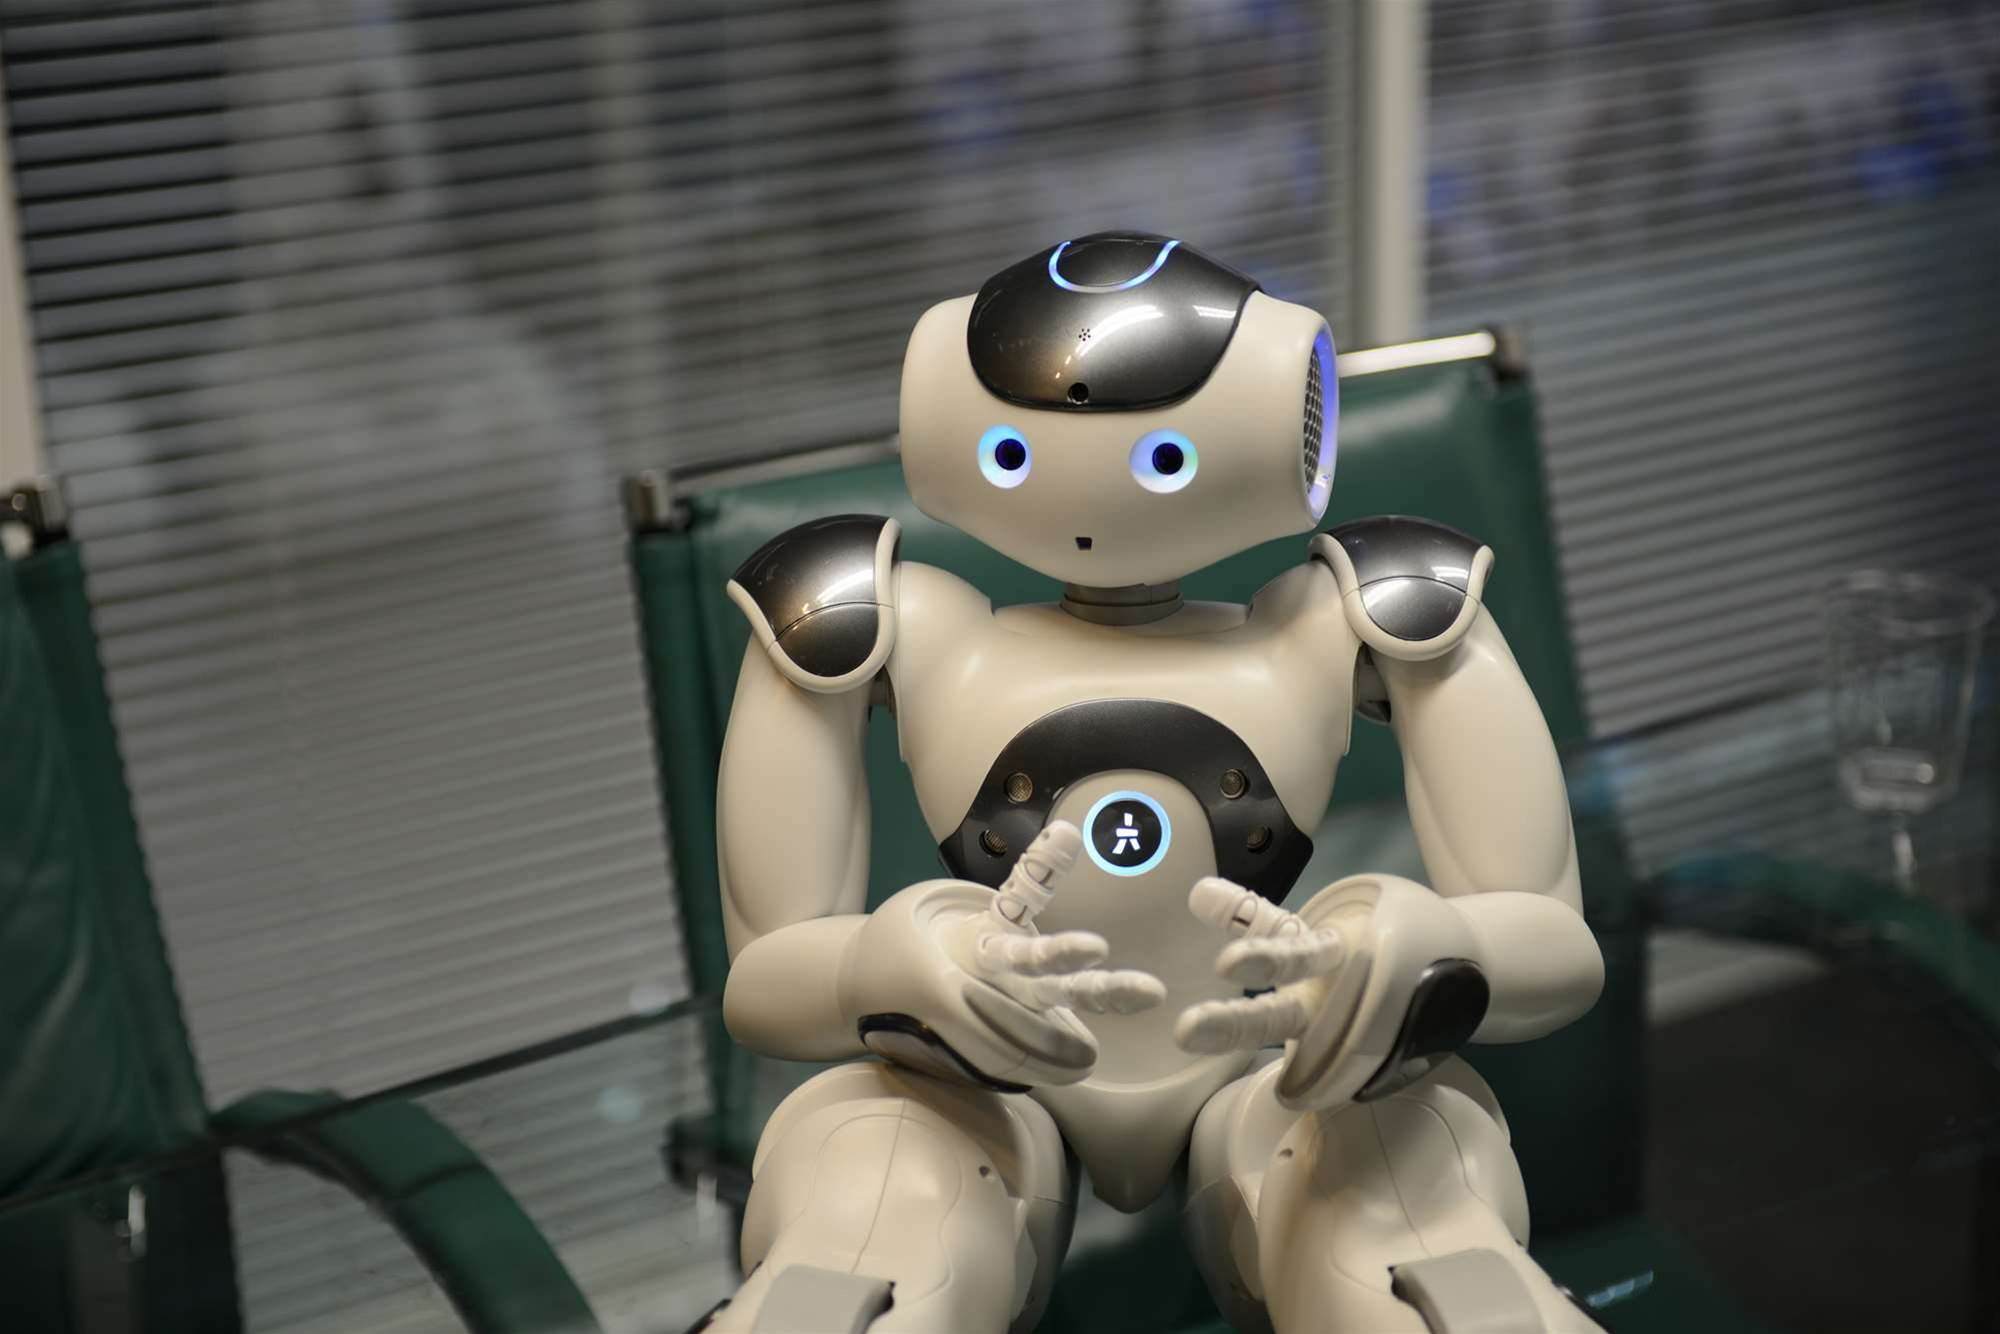 Polite Robots Show Glimmer of Self-Awareness